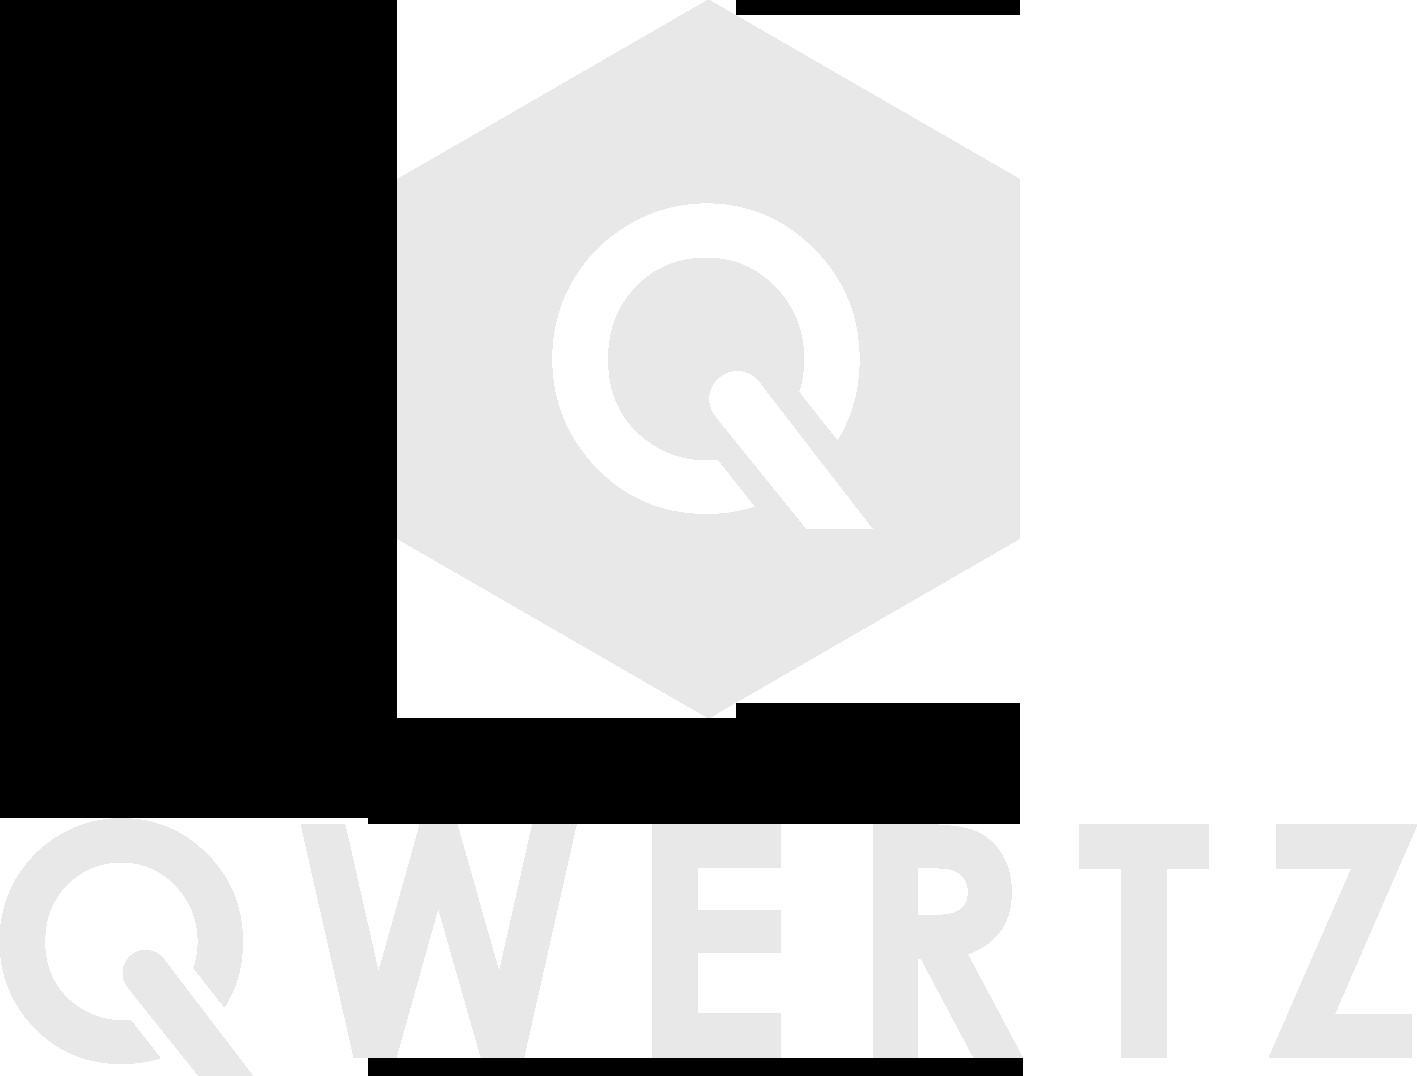 Logo Qwertz